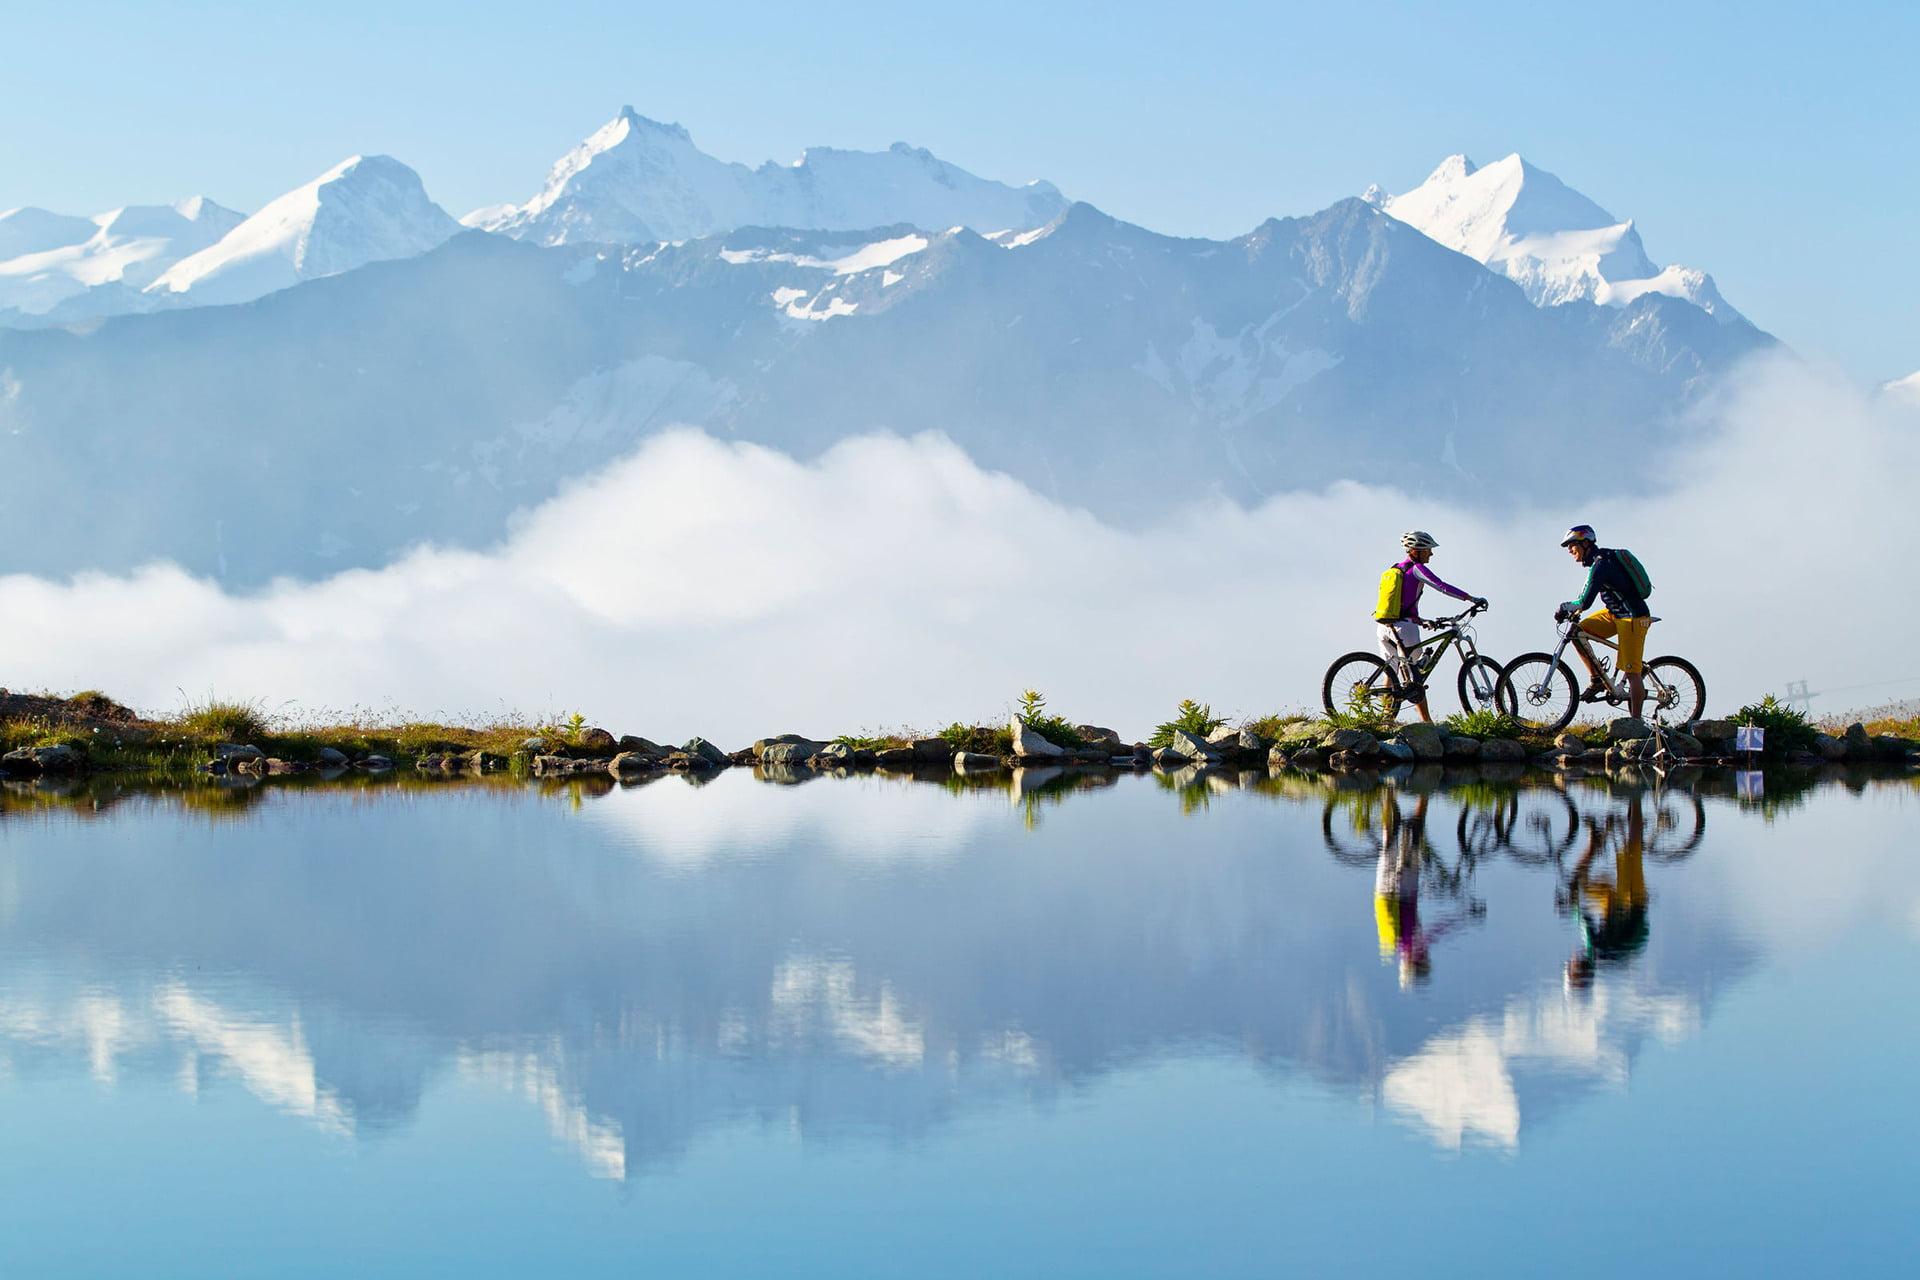 mountainbike in engadin st moritz summer in engadin st moritz. Black Bedroom Furniture Sets. Home Design Ideas